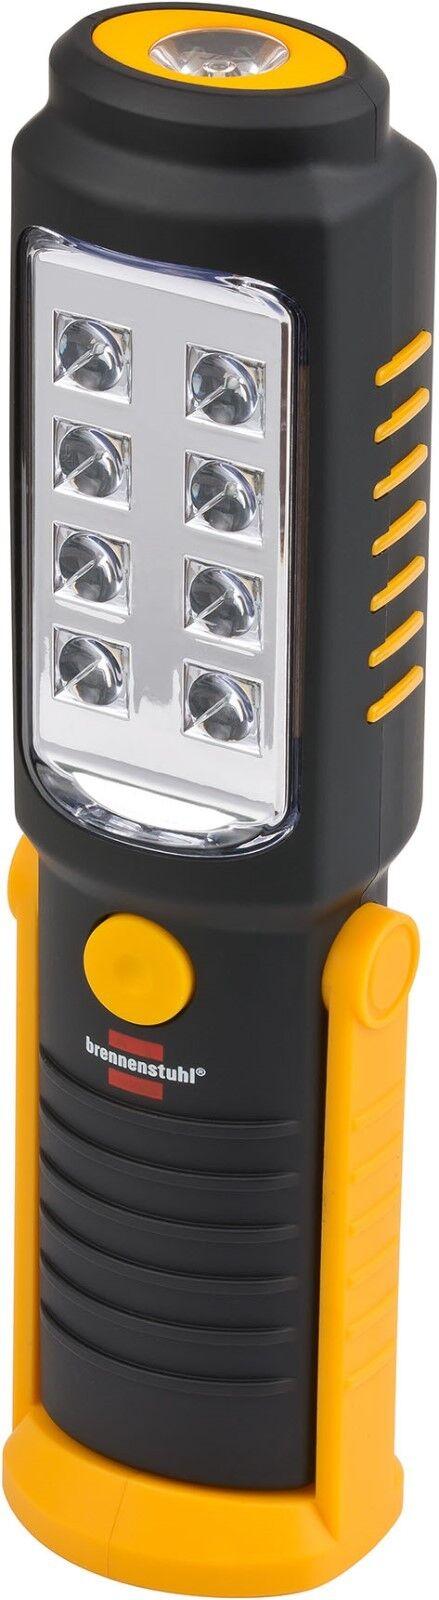 Brennenstuhl Universal Hand Lamp 8+1 SMD LED 250   100 Lumens DB81M1H1